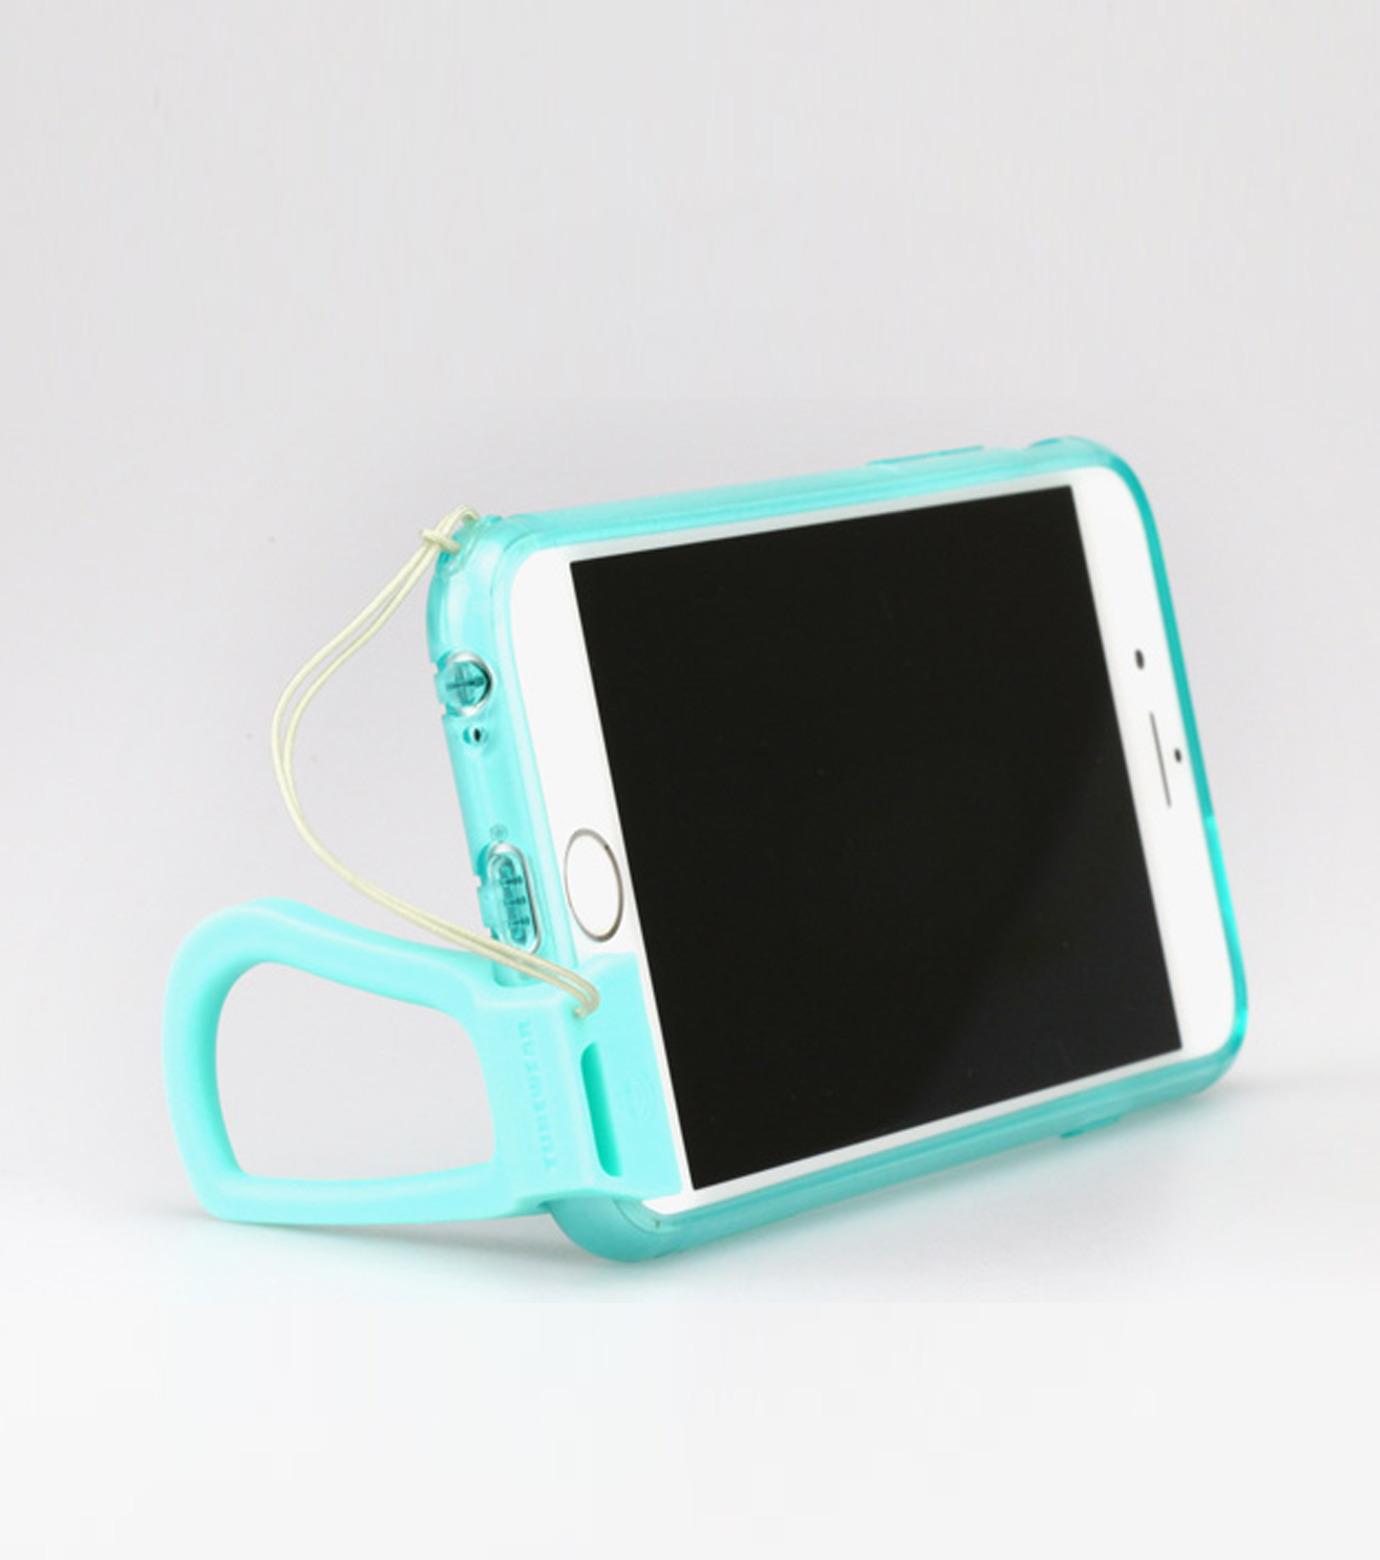 Tunewear(チューンウエア)のsoftshell 6/6s-NONE(ケースiphone6/6s/case iphone6/6s)-TUN-PH-0398-0 拡大詳細画像8